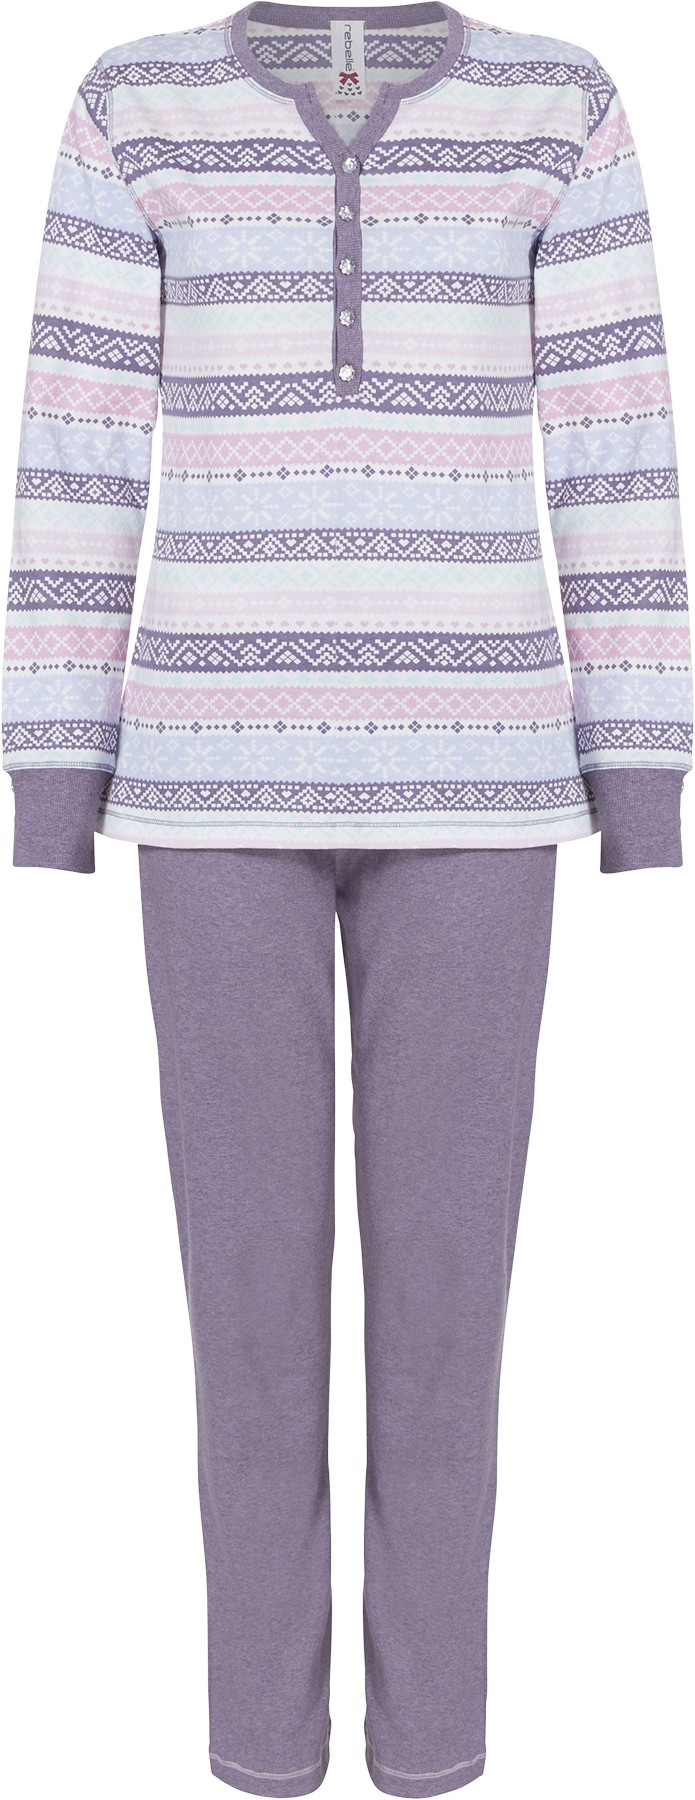 Dames pyjama Rebelle 2172-210-2-36